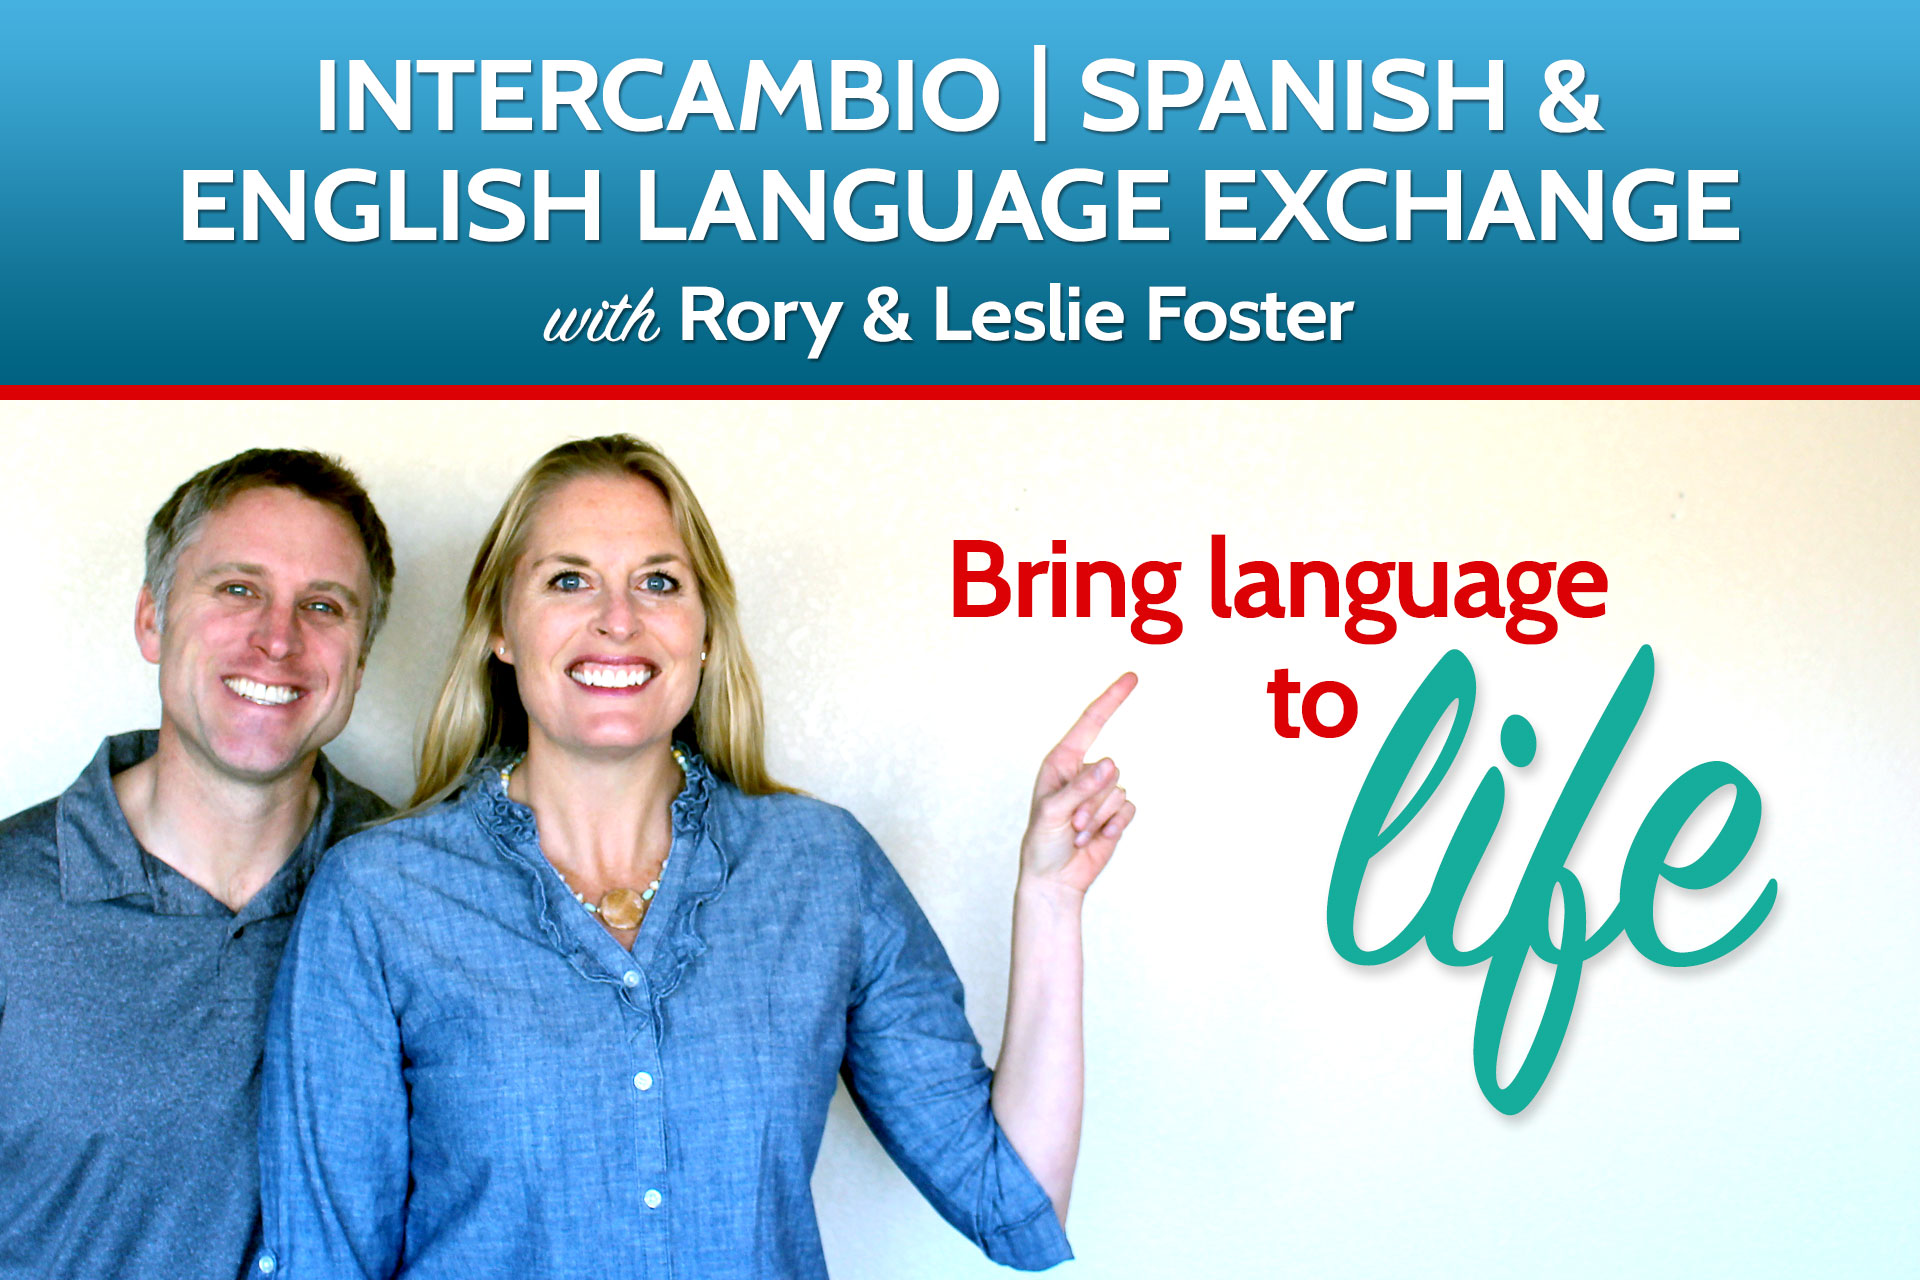 Spanish – English Practice Group: Online Intercambio Language Exchange